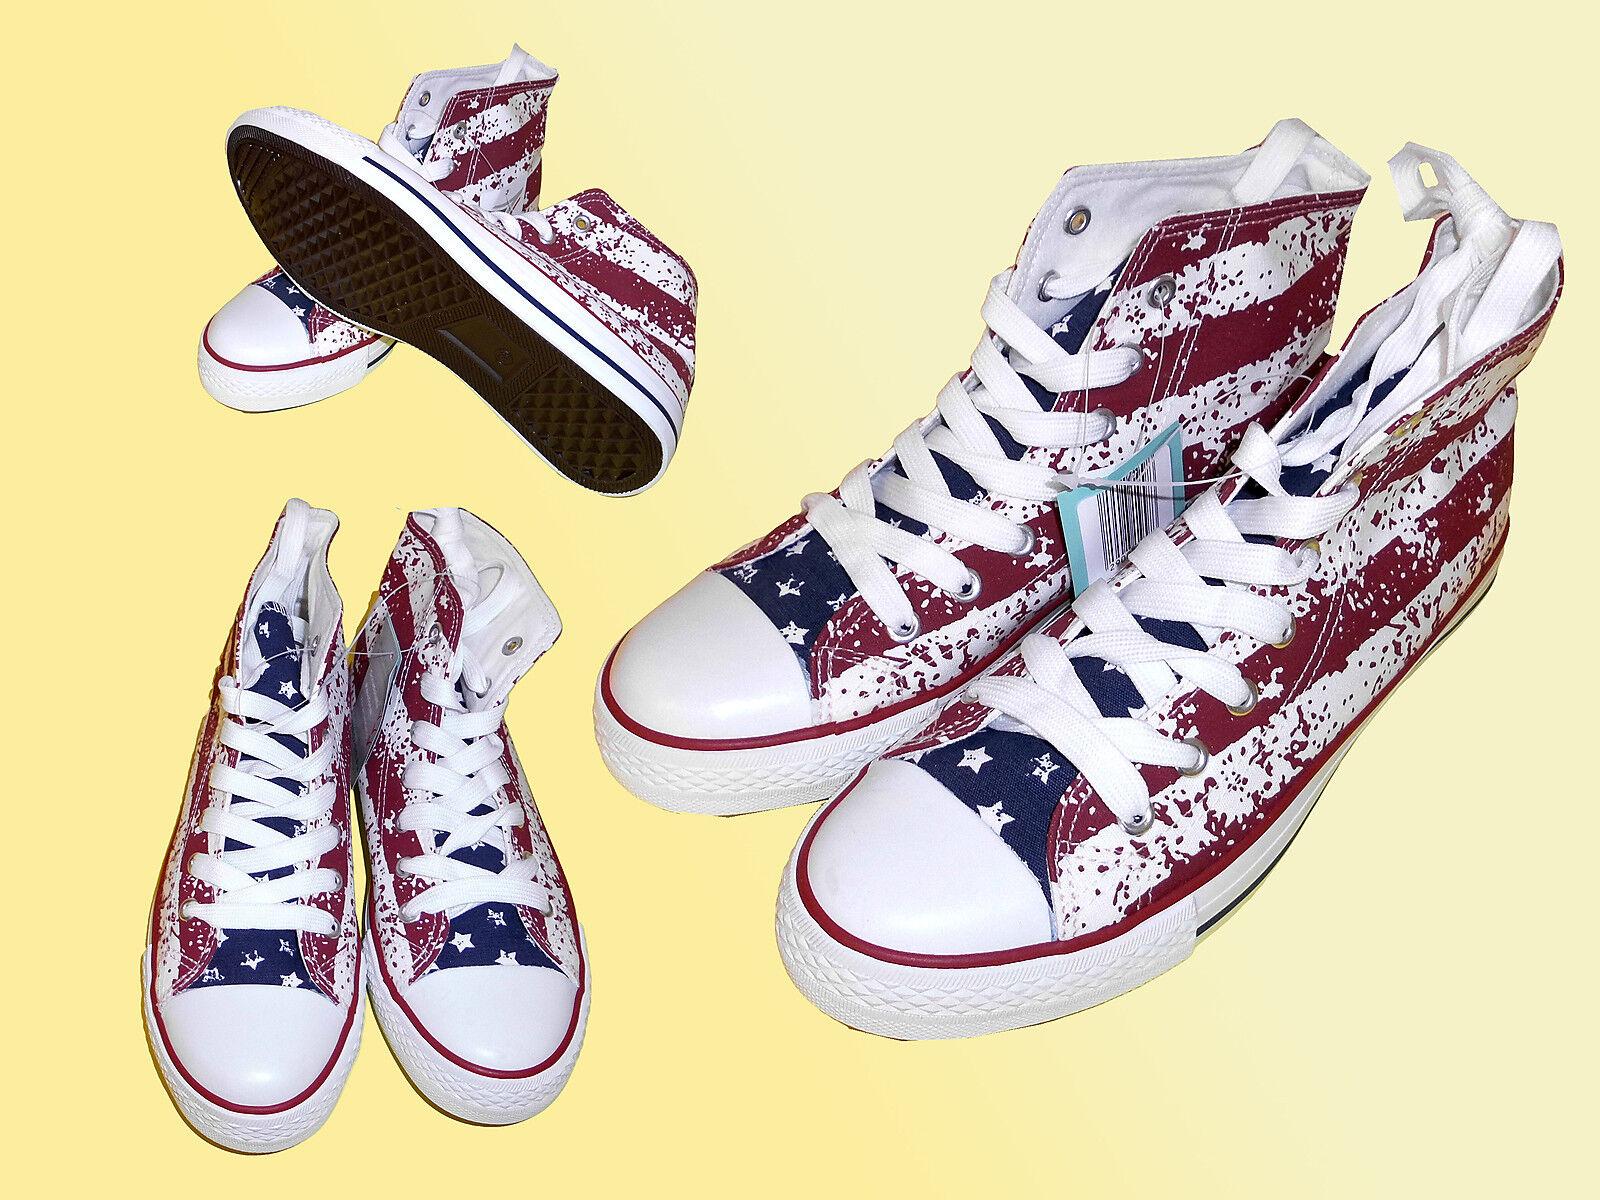 modern Women's shoes Casual Shoes Canvas shoes canvas shoes Women's Trainers Sneakers 36-41 06bb43